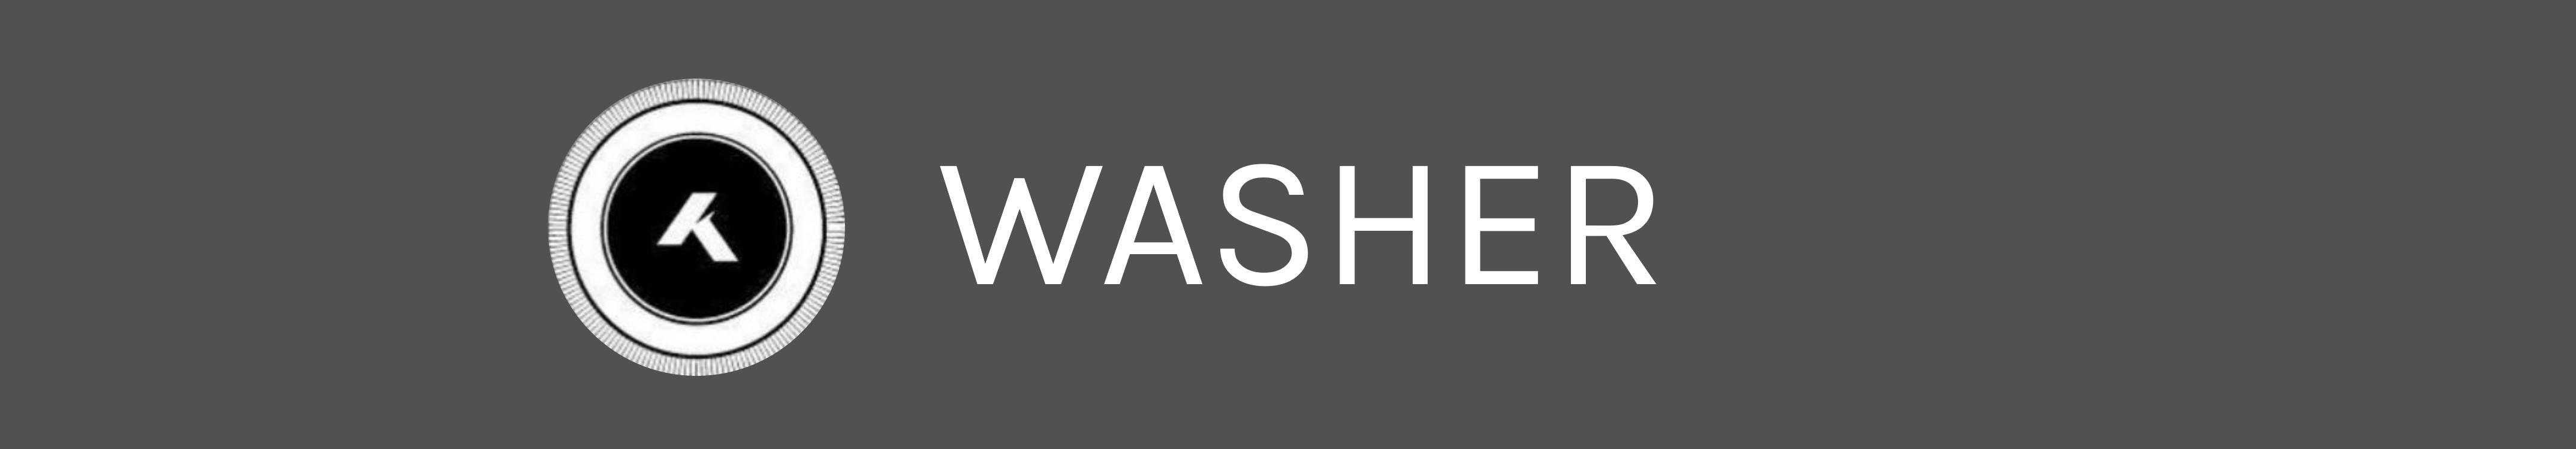 KHE-Banner-washer